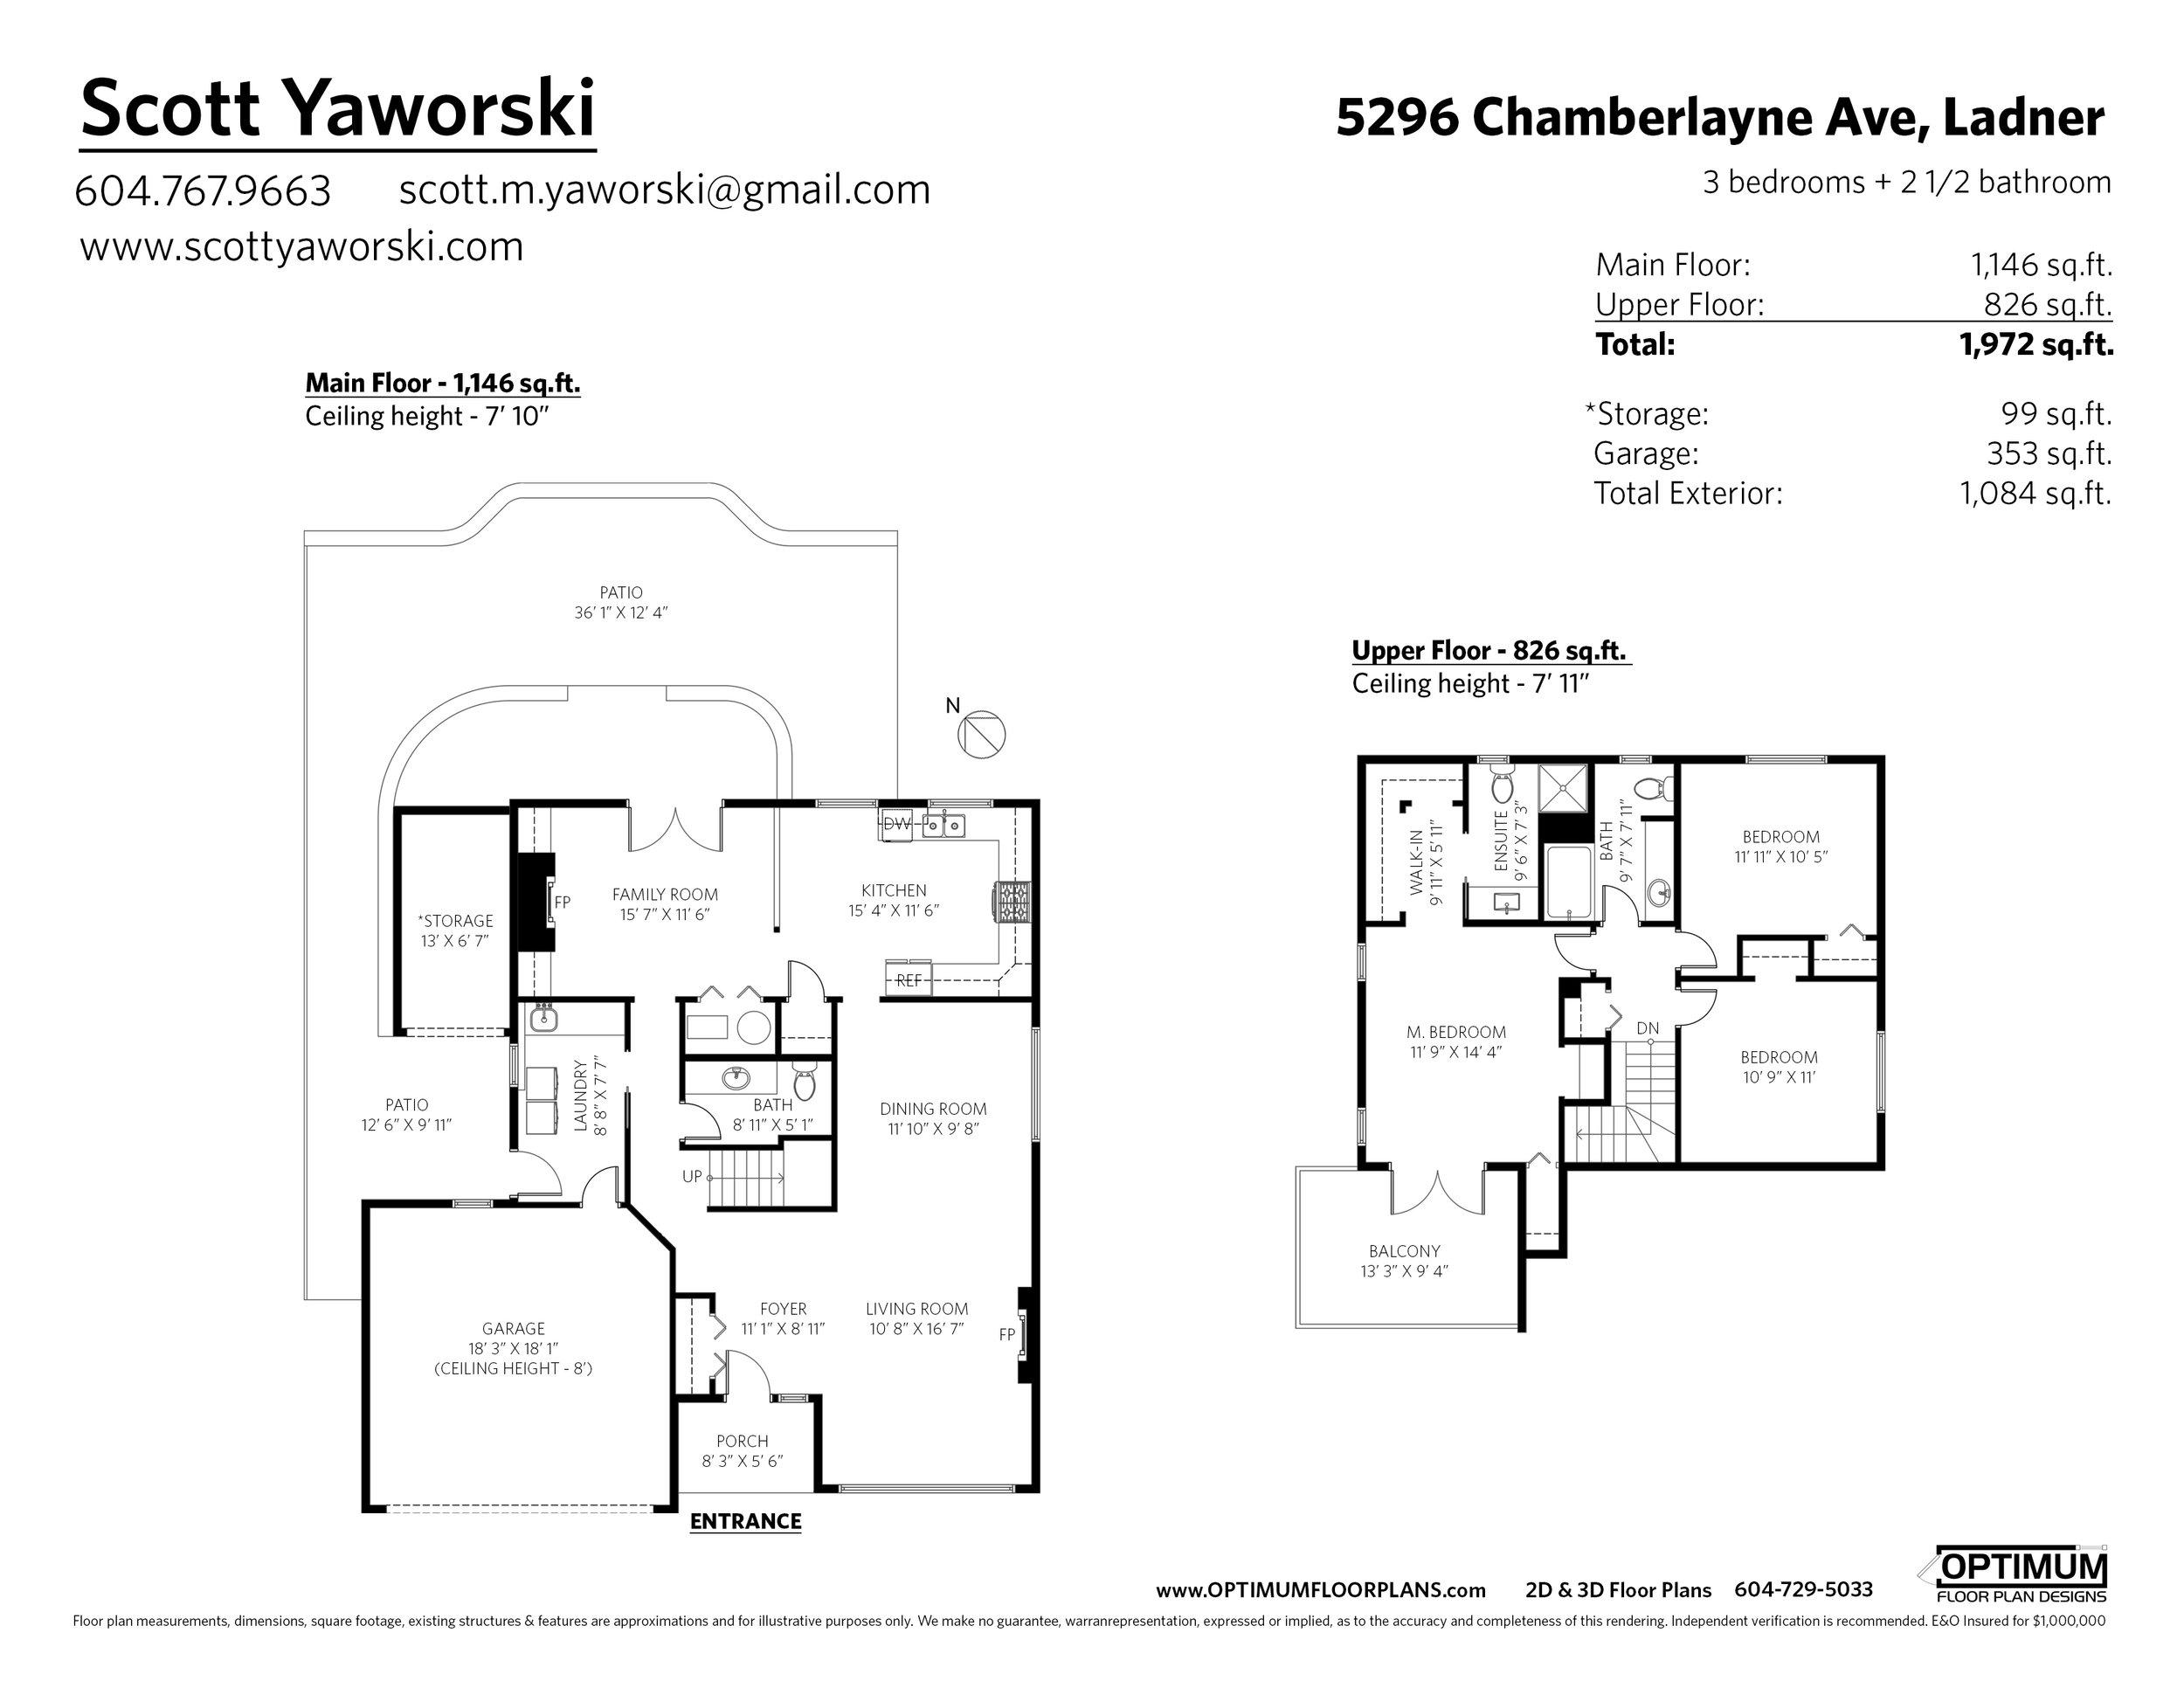 5296_Chamberlayne_Avenue.jpg